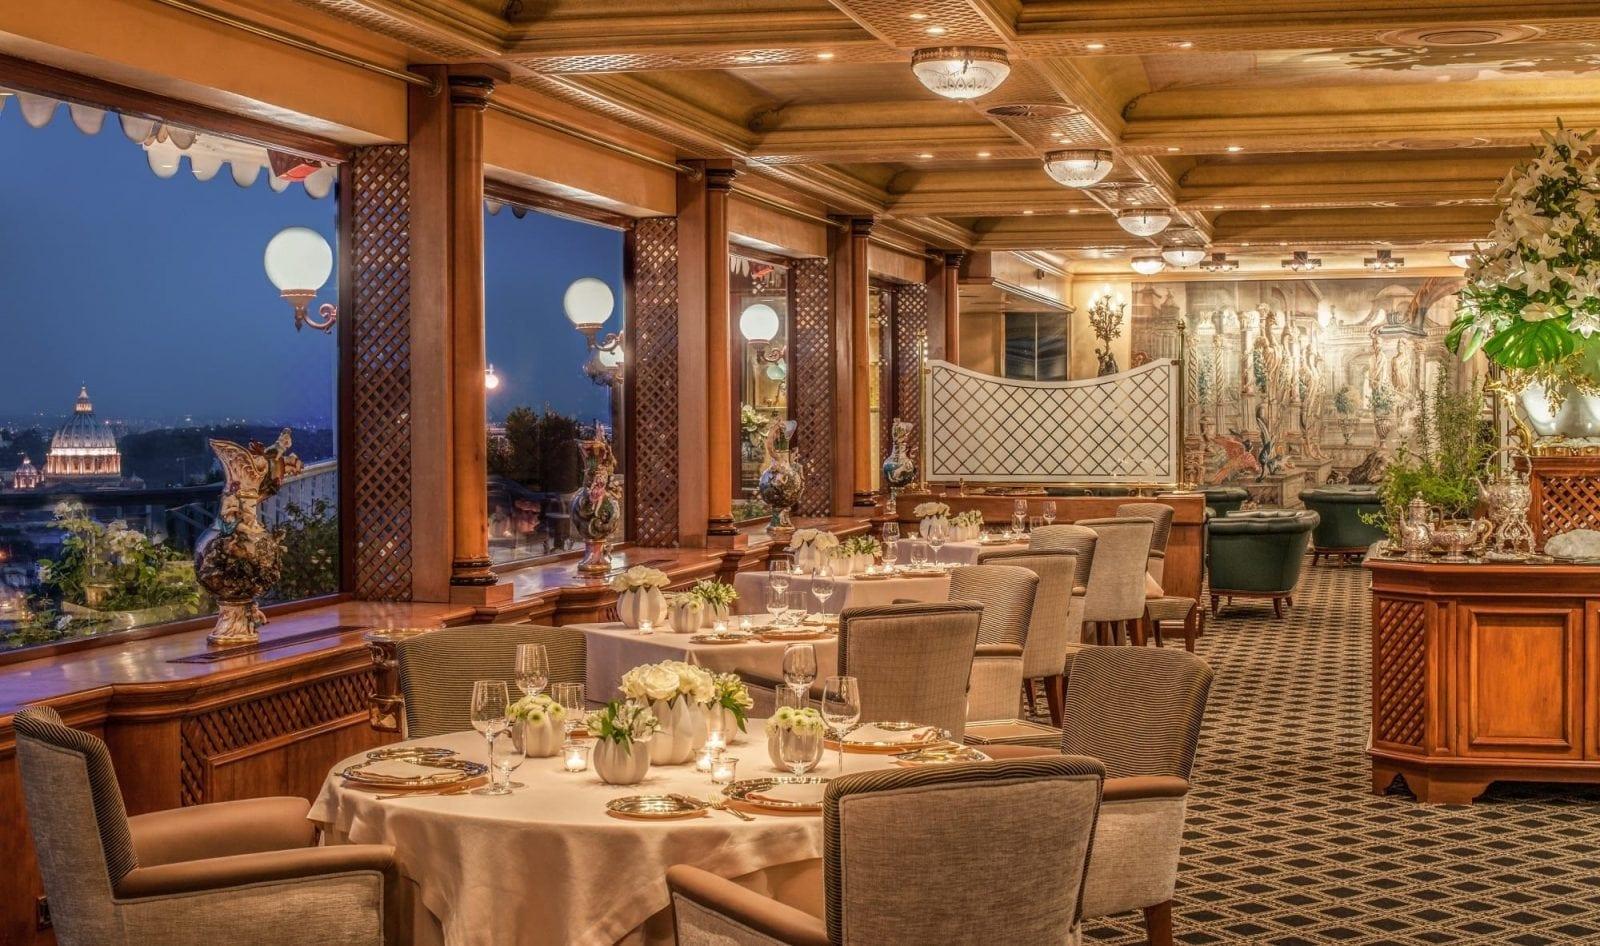 10.La Pergola Rome - Top 10 restaurante cu stele Michelin din Europa